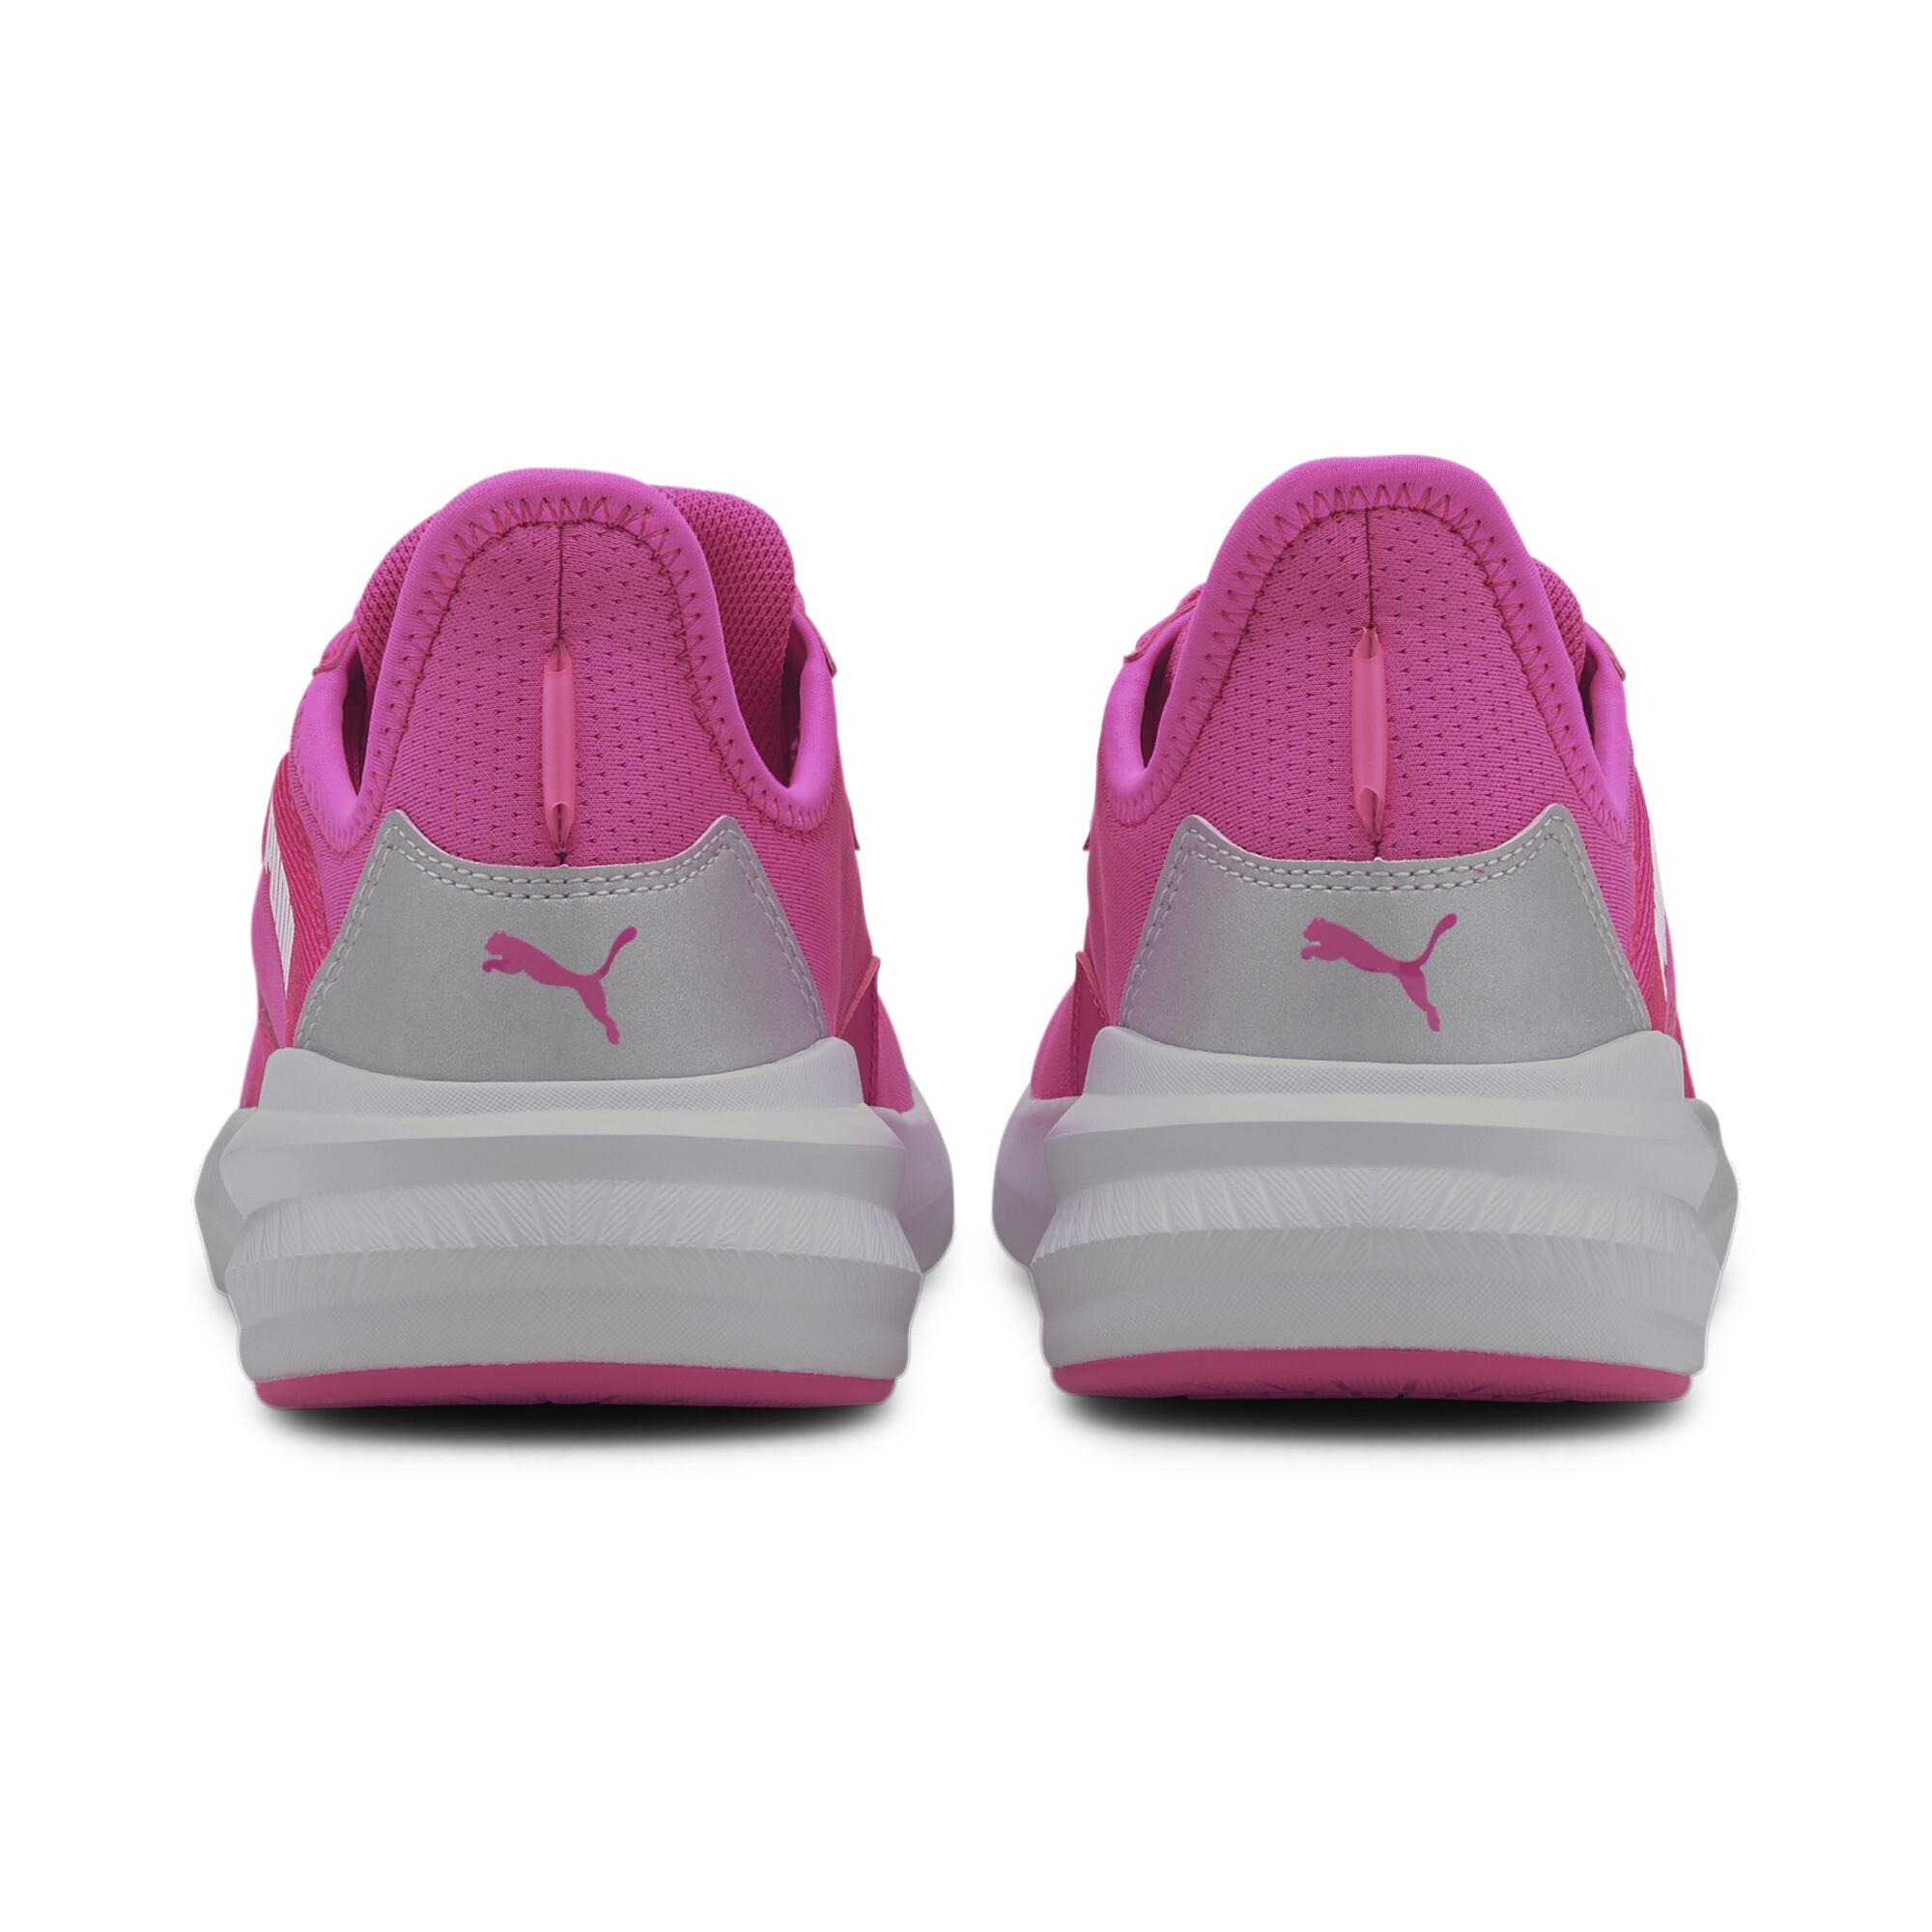 thumbnail 10 - PUMA-Women-039-s-Platinum-Training-Shoes